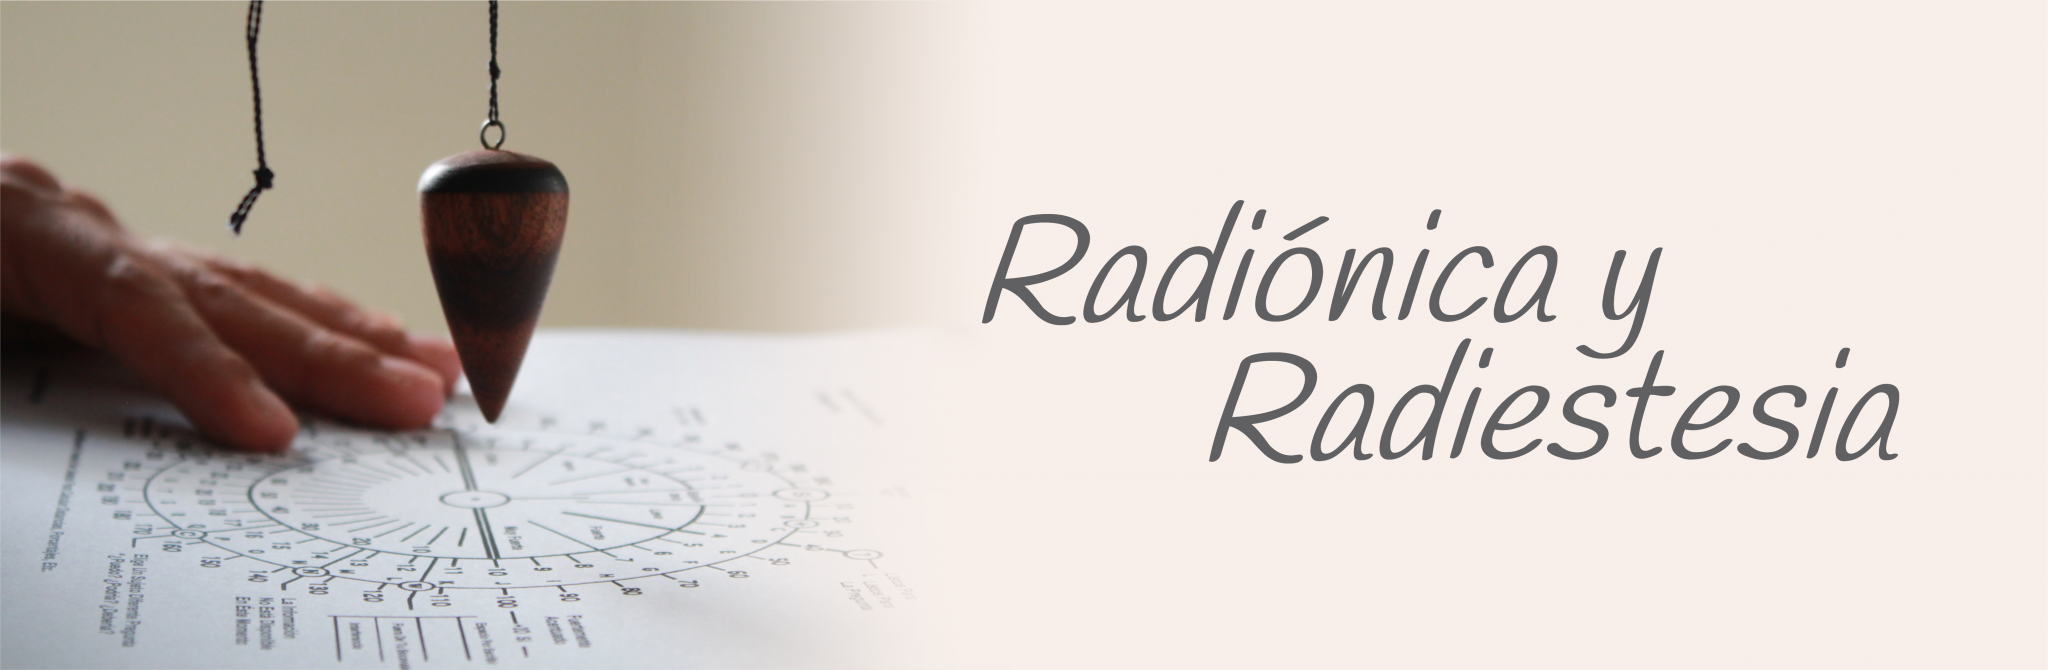 slide - radionica